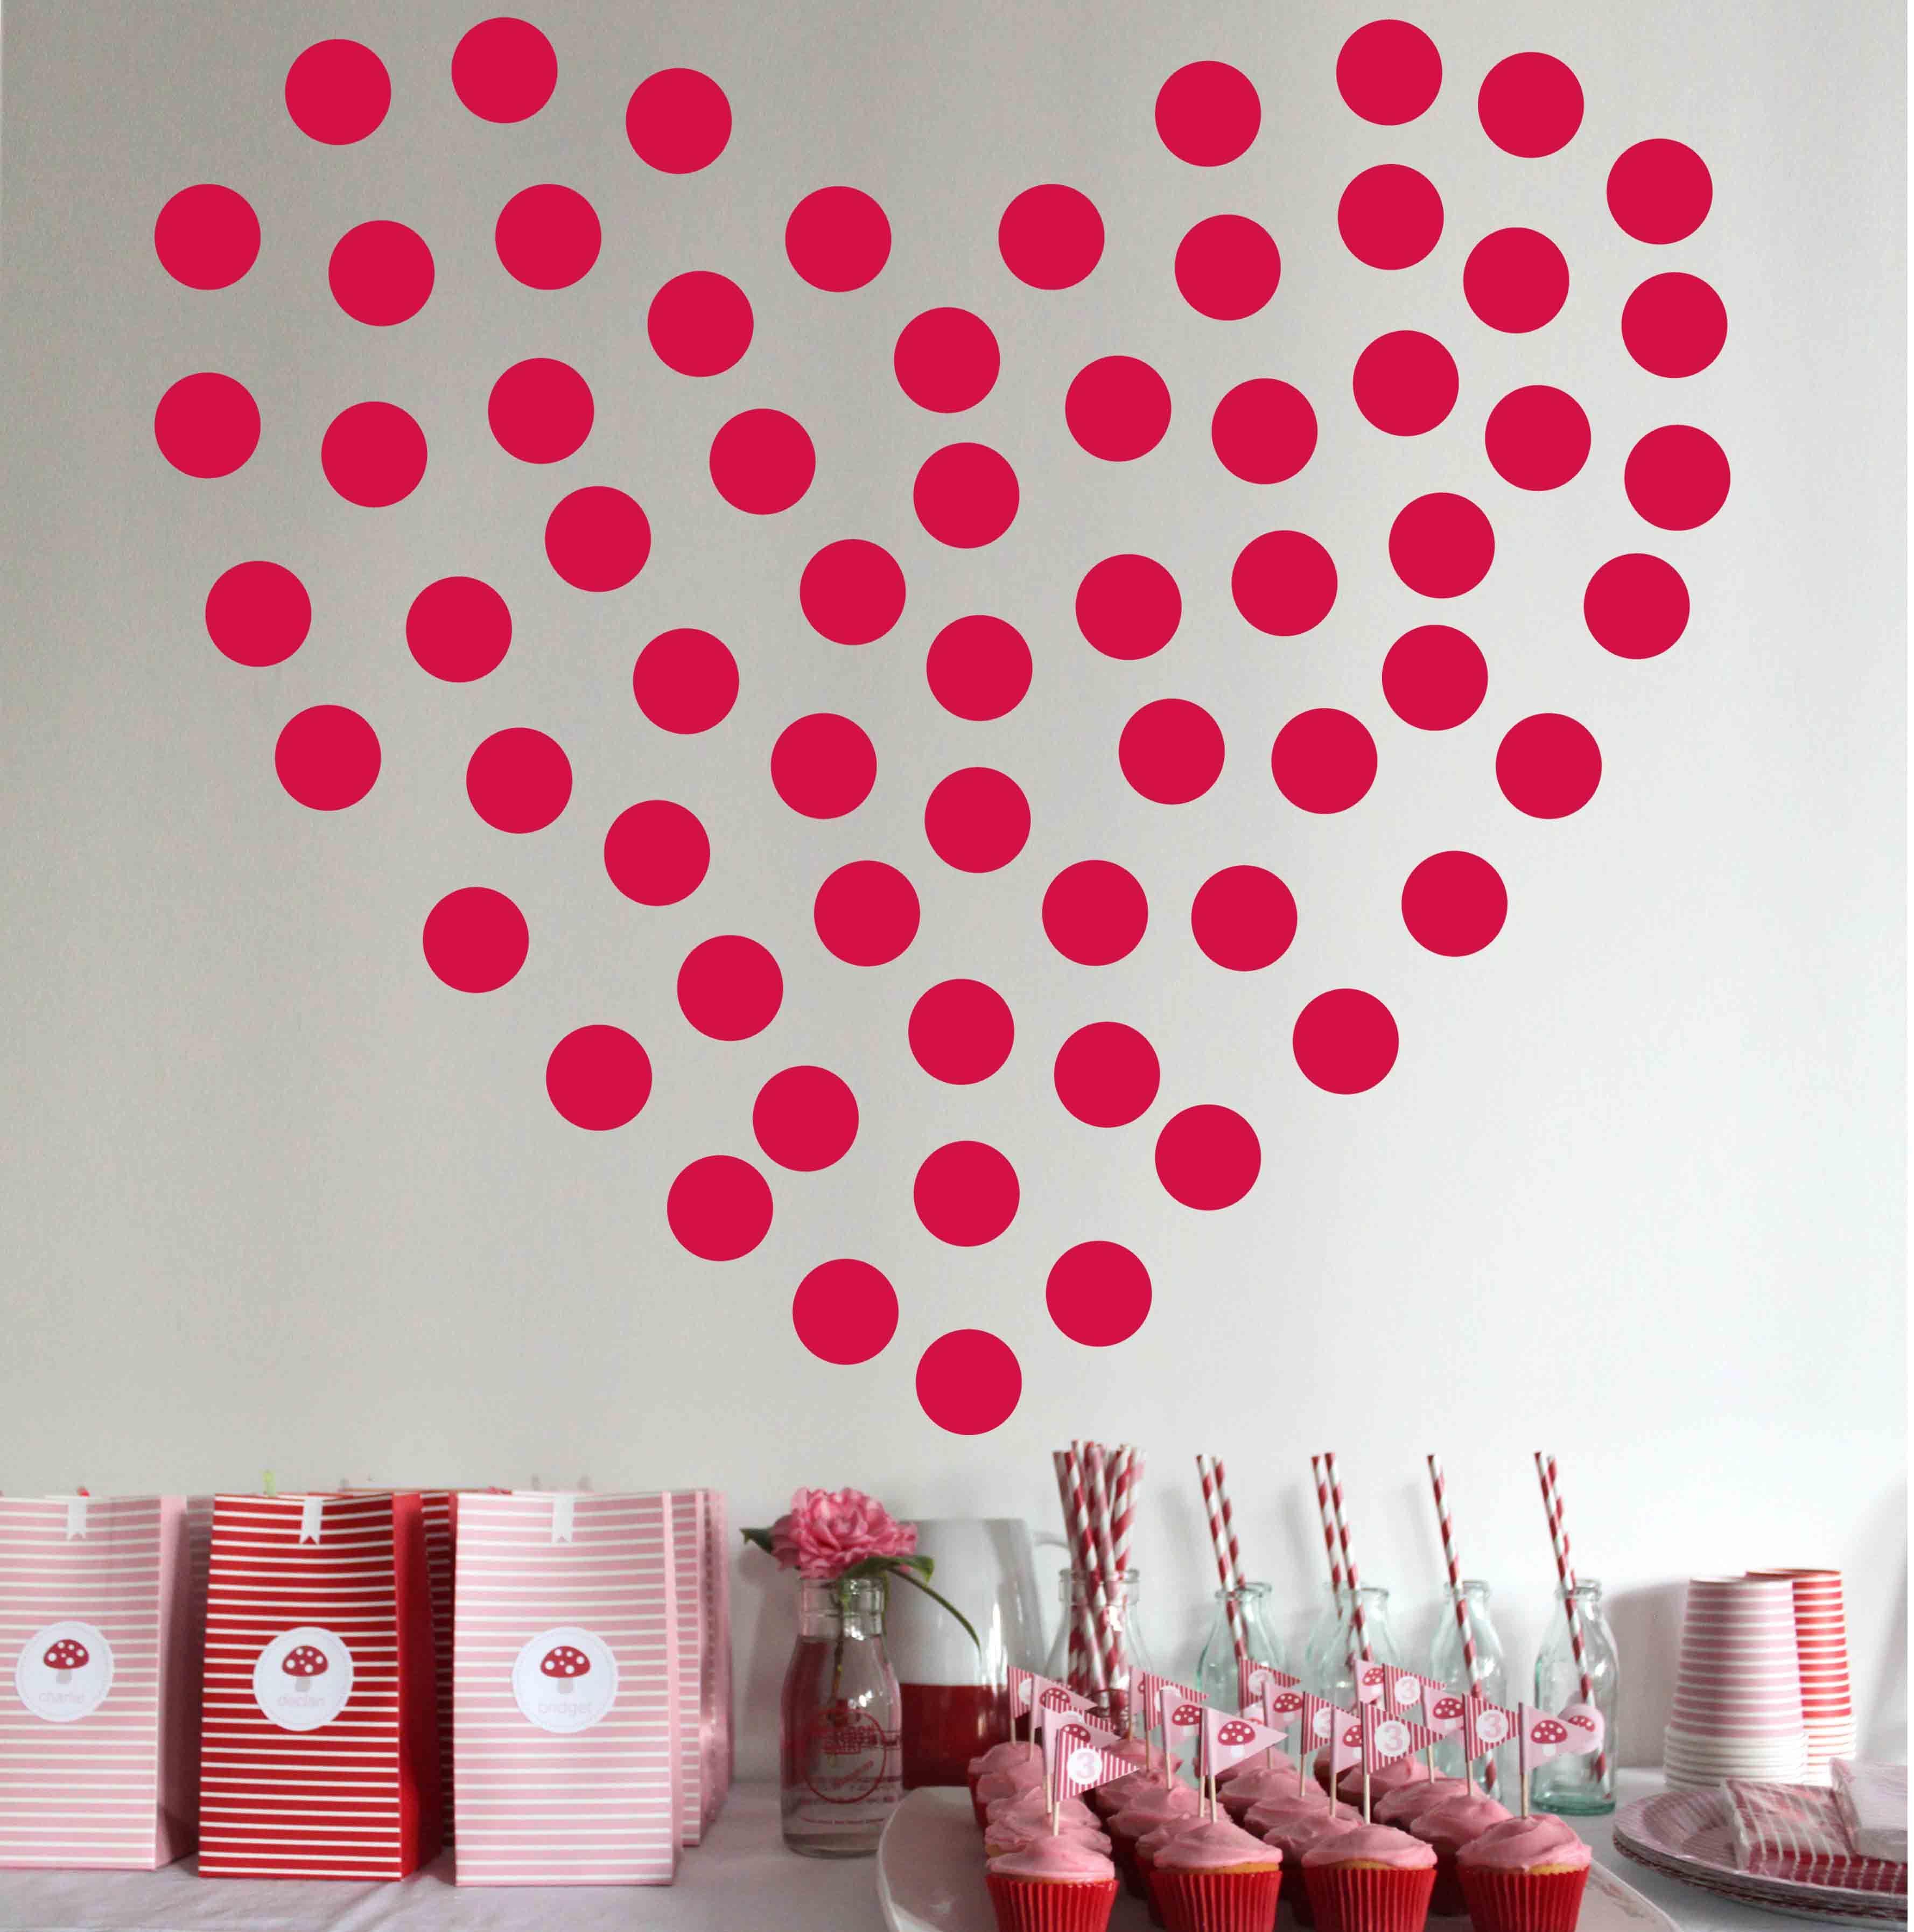 Bedroom Diy Wall Art